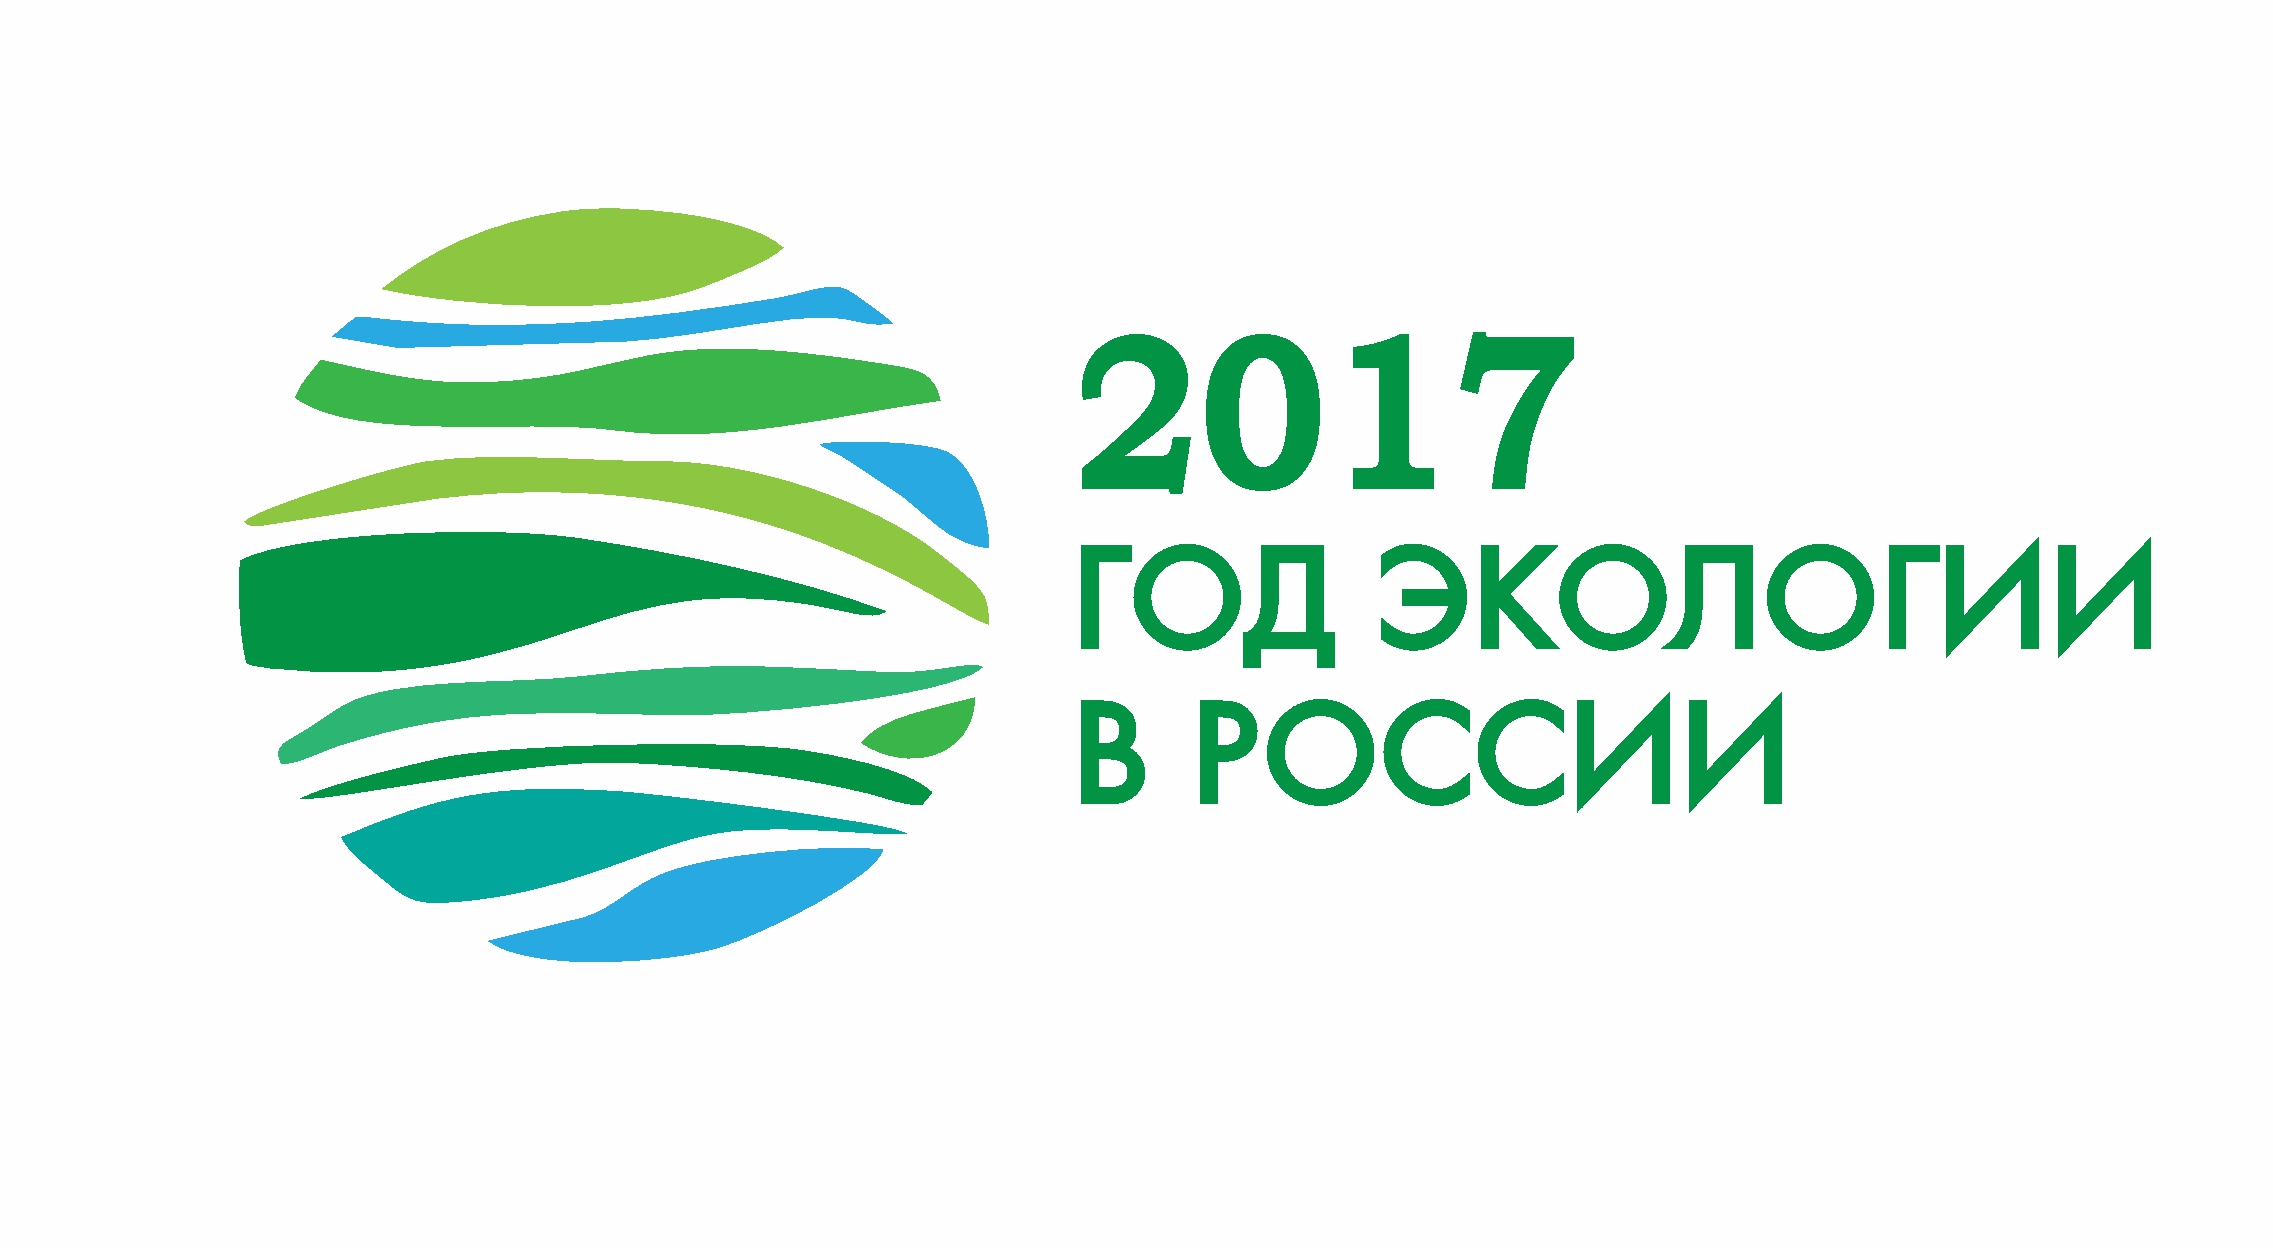 Картинки по запросу эмблема 2017 года